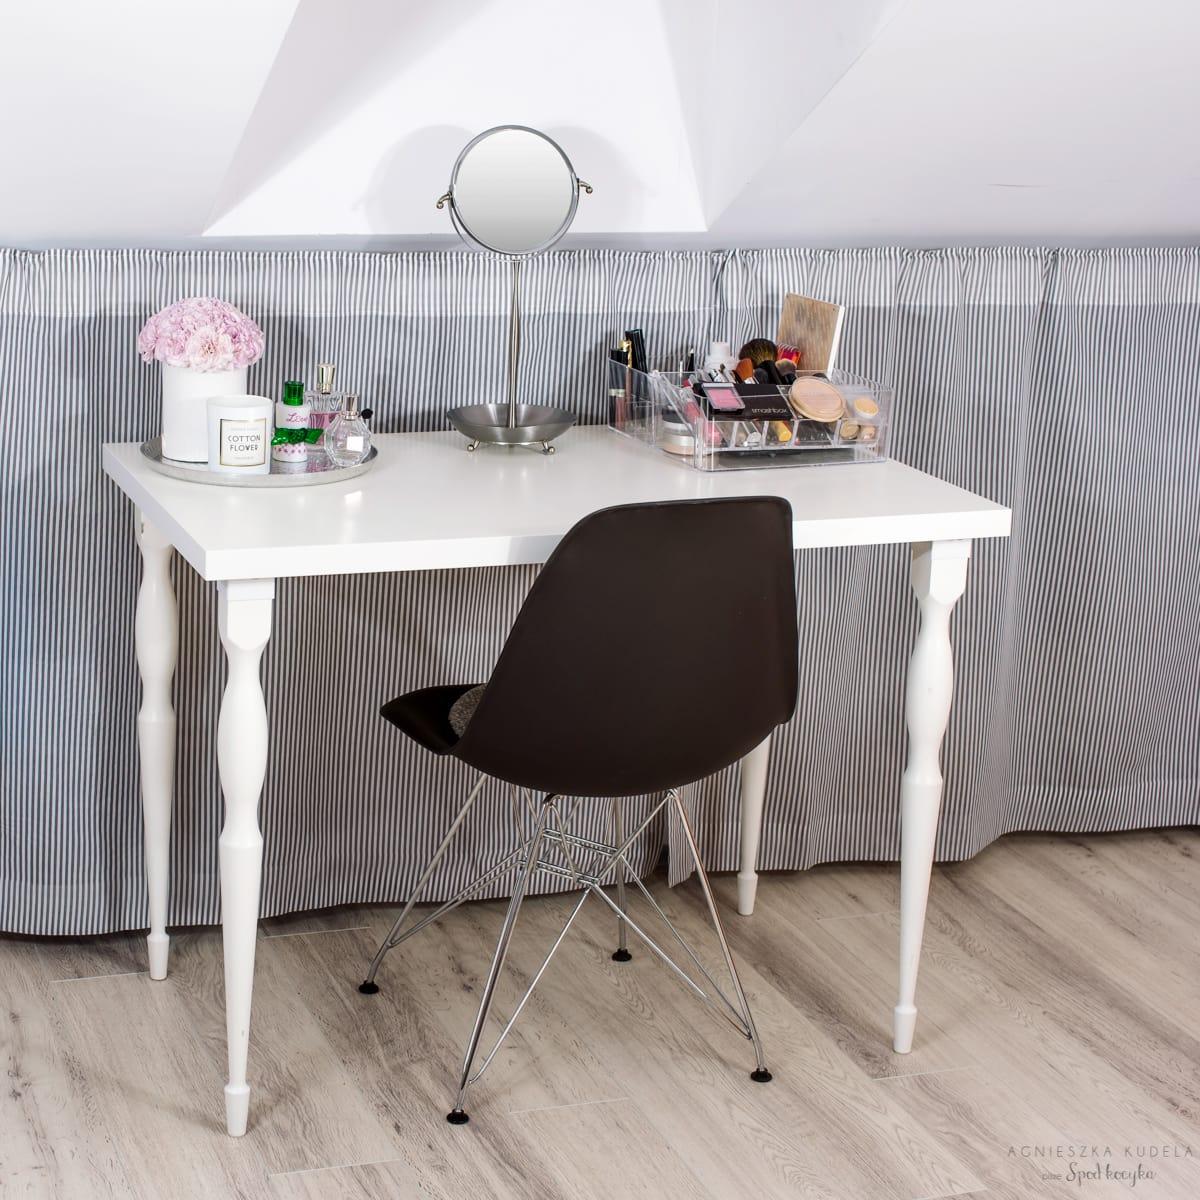 spodkocyka-minimalizm-toaletka-4